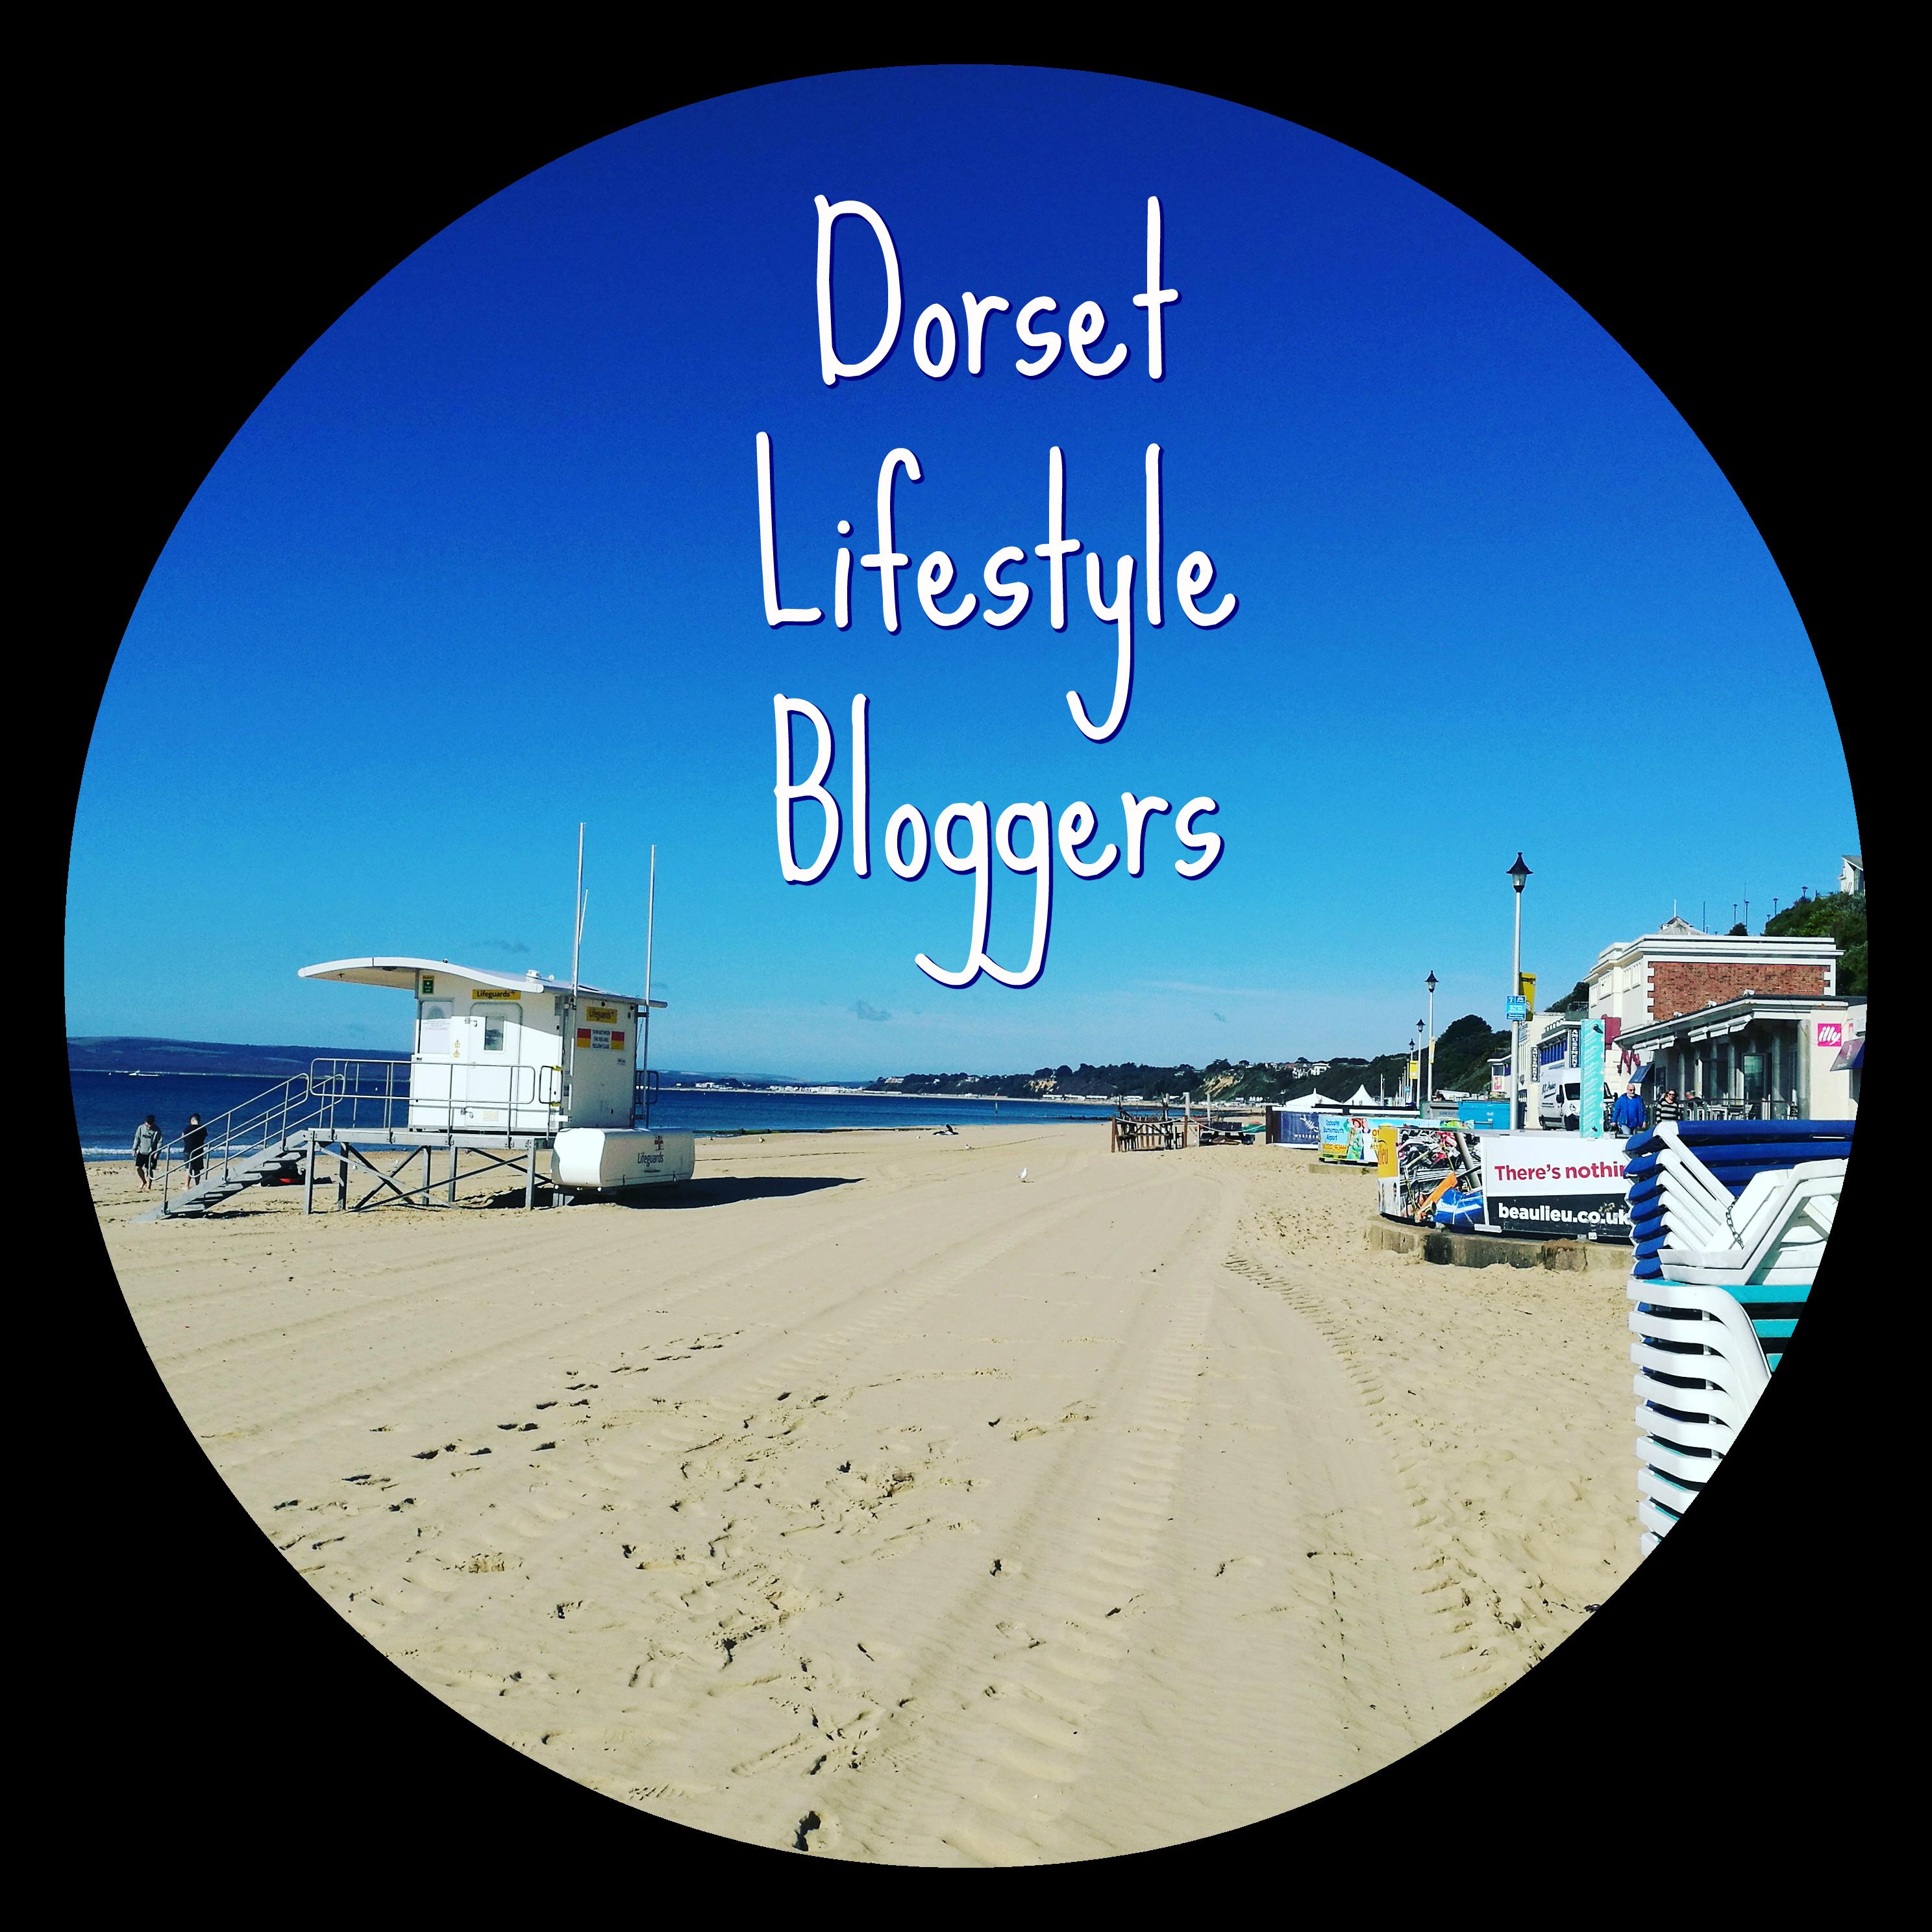 Dorset Lifestyle Bloggers